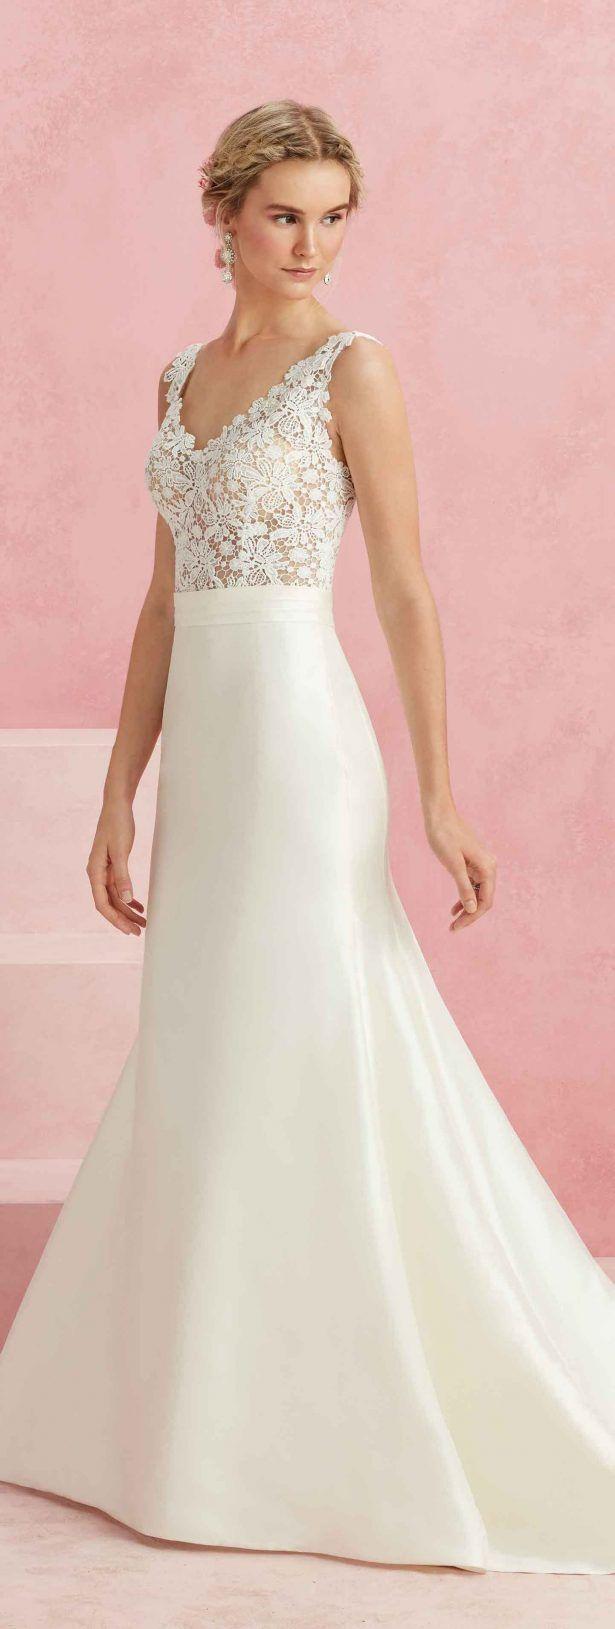 68 best Wedding dresses images on Pinterest | Wedding frocks ...